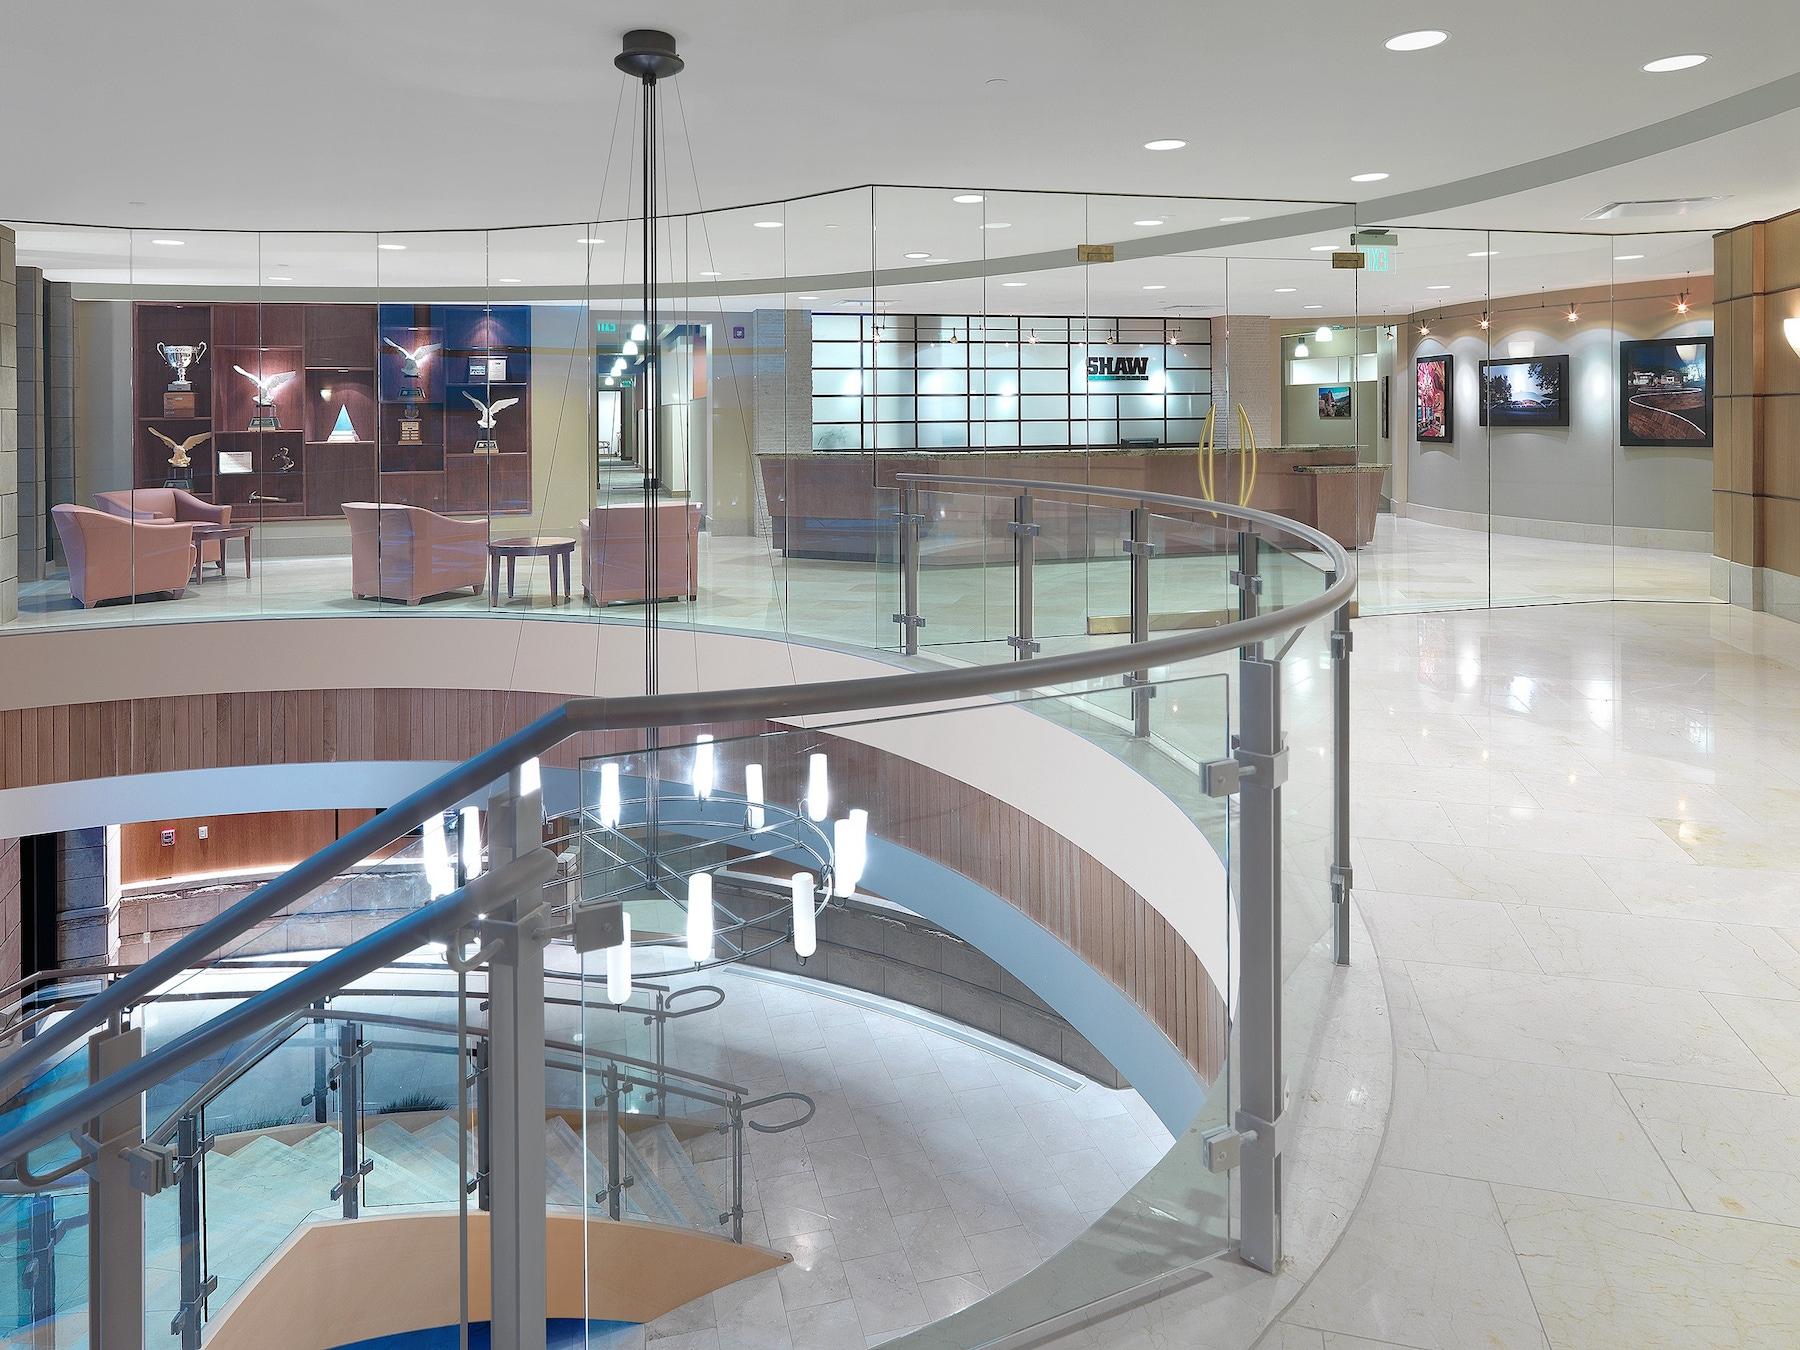 003 GJ office building interior